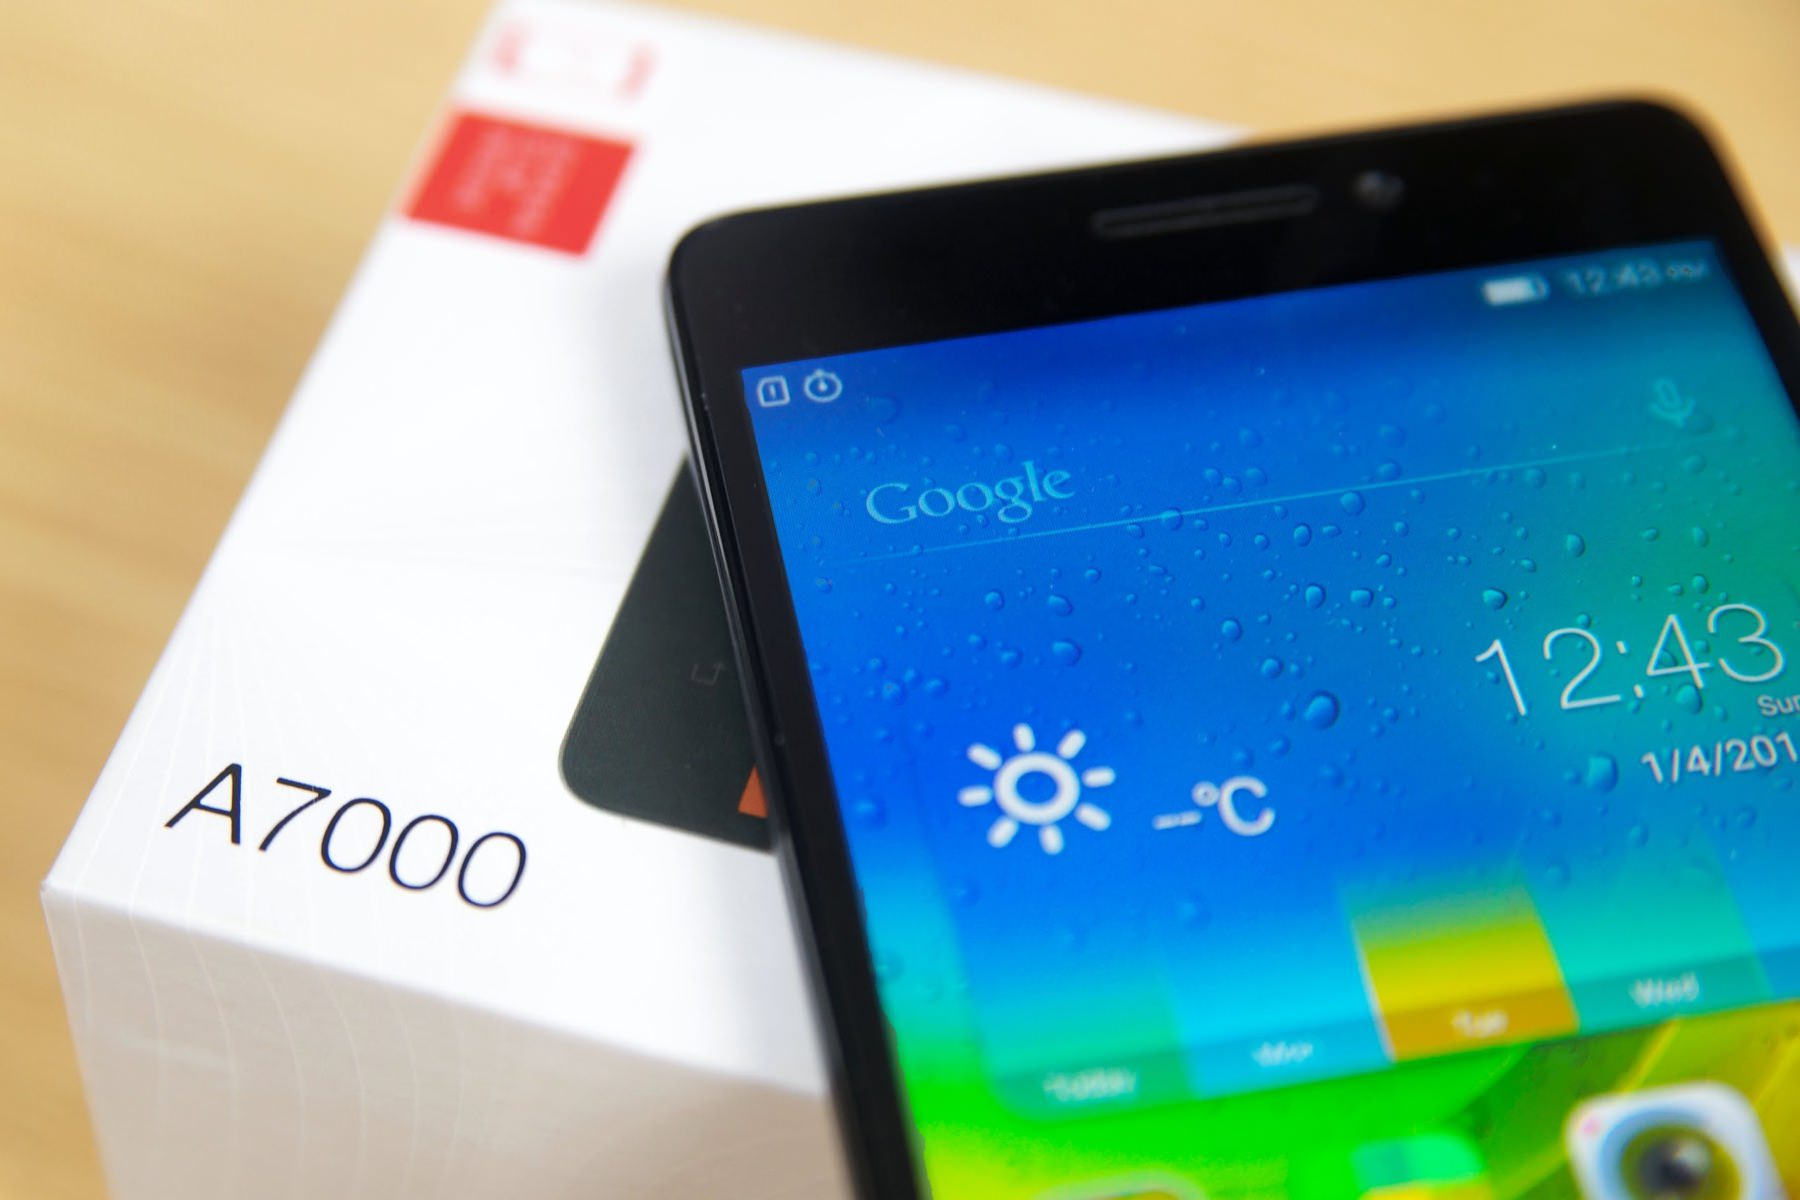 Бюджетный Lenovo A7000 начал обновляться до Android 6.0 Marshmallow